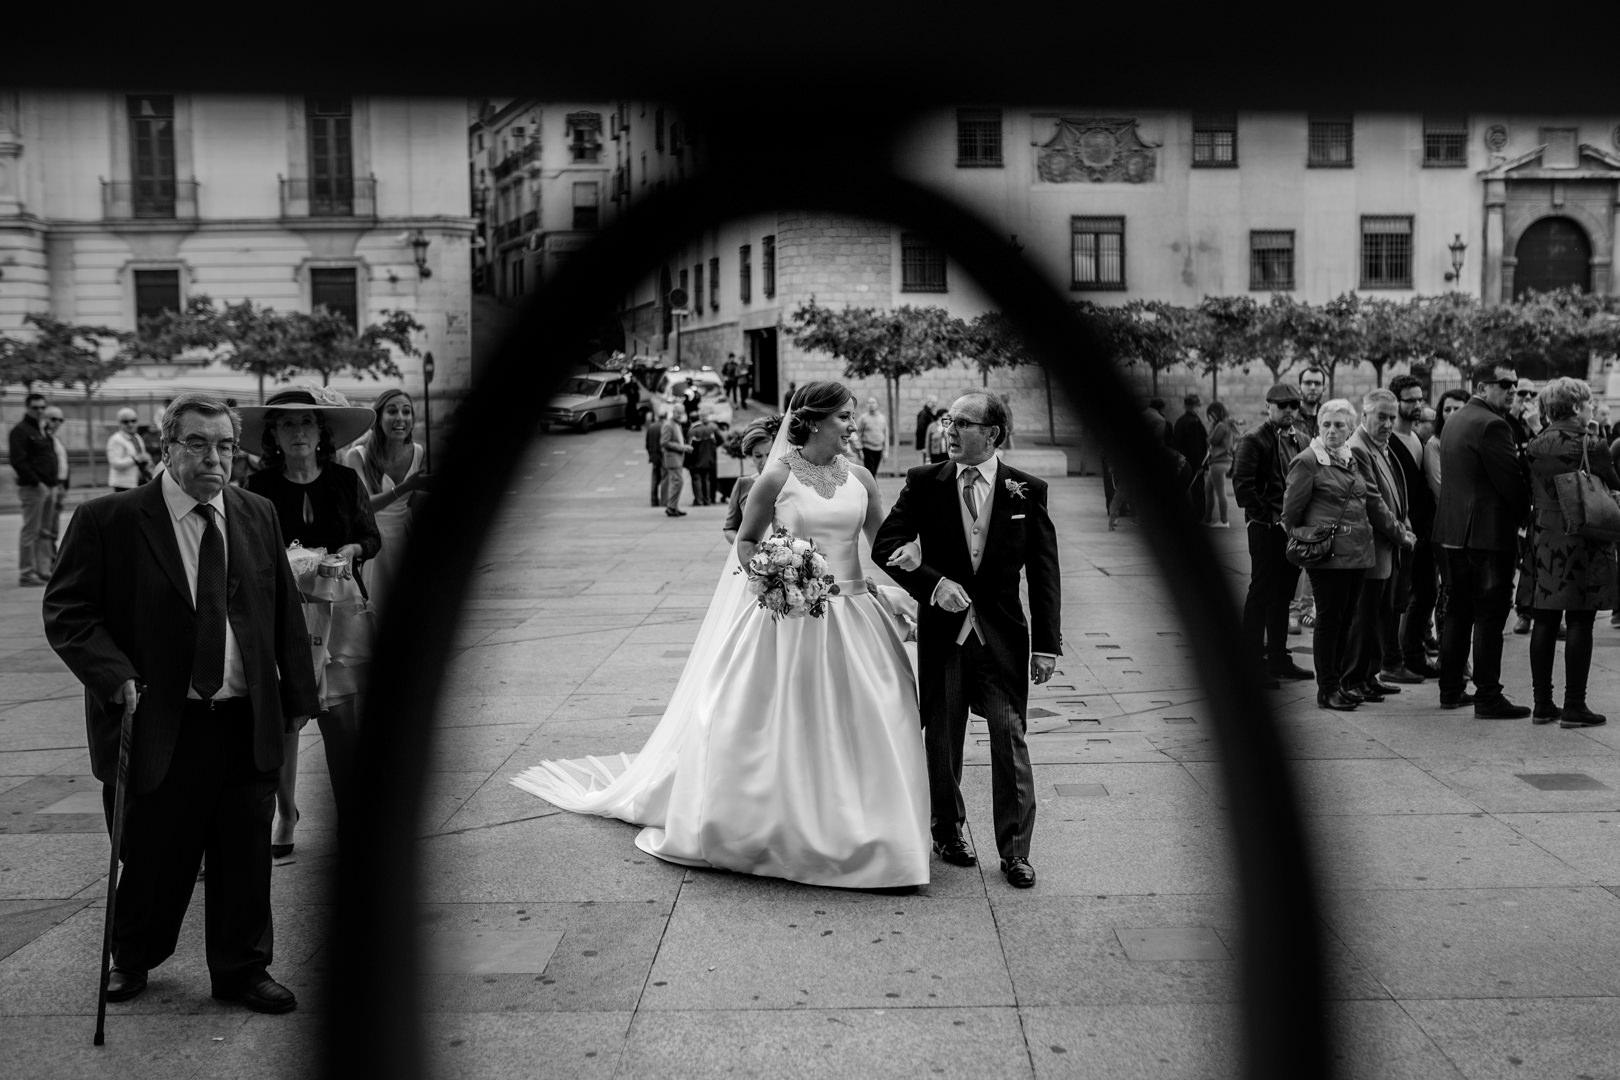 Boda-Catedral-Jaen-Hamburgo-Maria-David-engagement-Rafael-Torres-fotografo-bodas-sevilla-madrid-barcelona-wedding-photographer--18.jpg